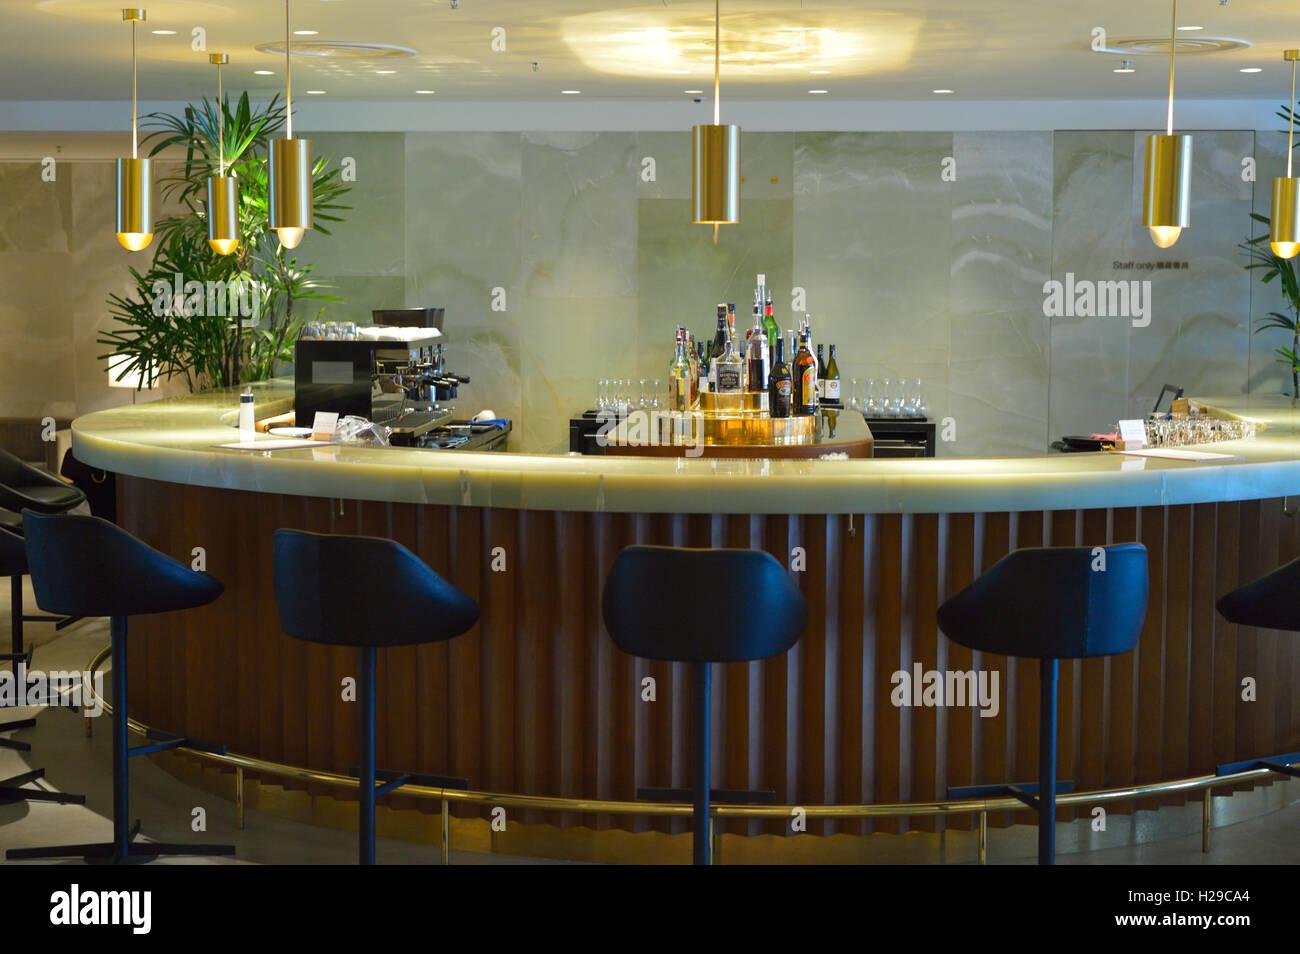 Hong Kong Drinks Stockfotos & Hong Kong Drinks Bilder - Alamy